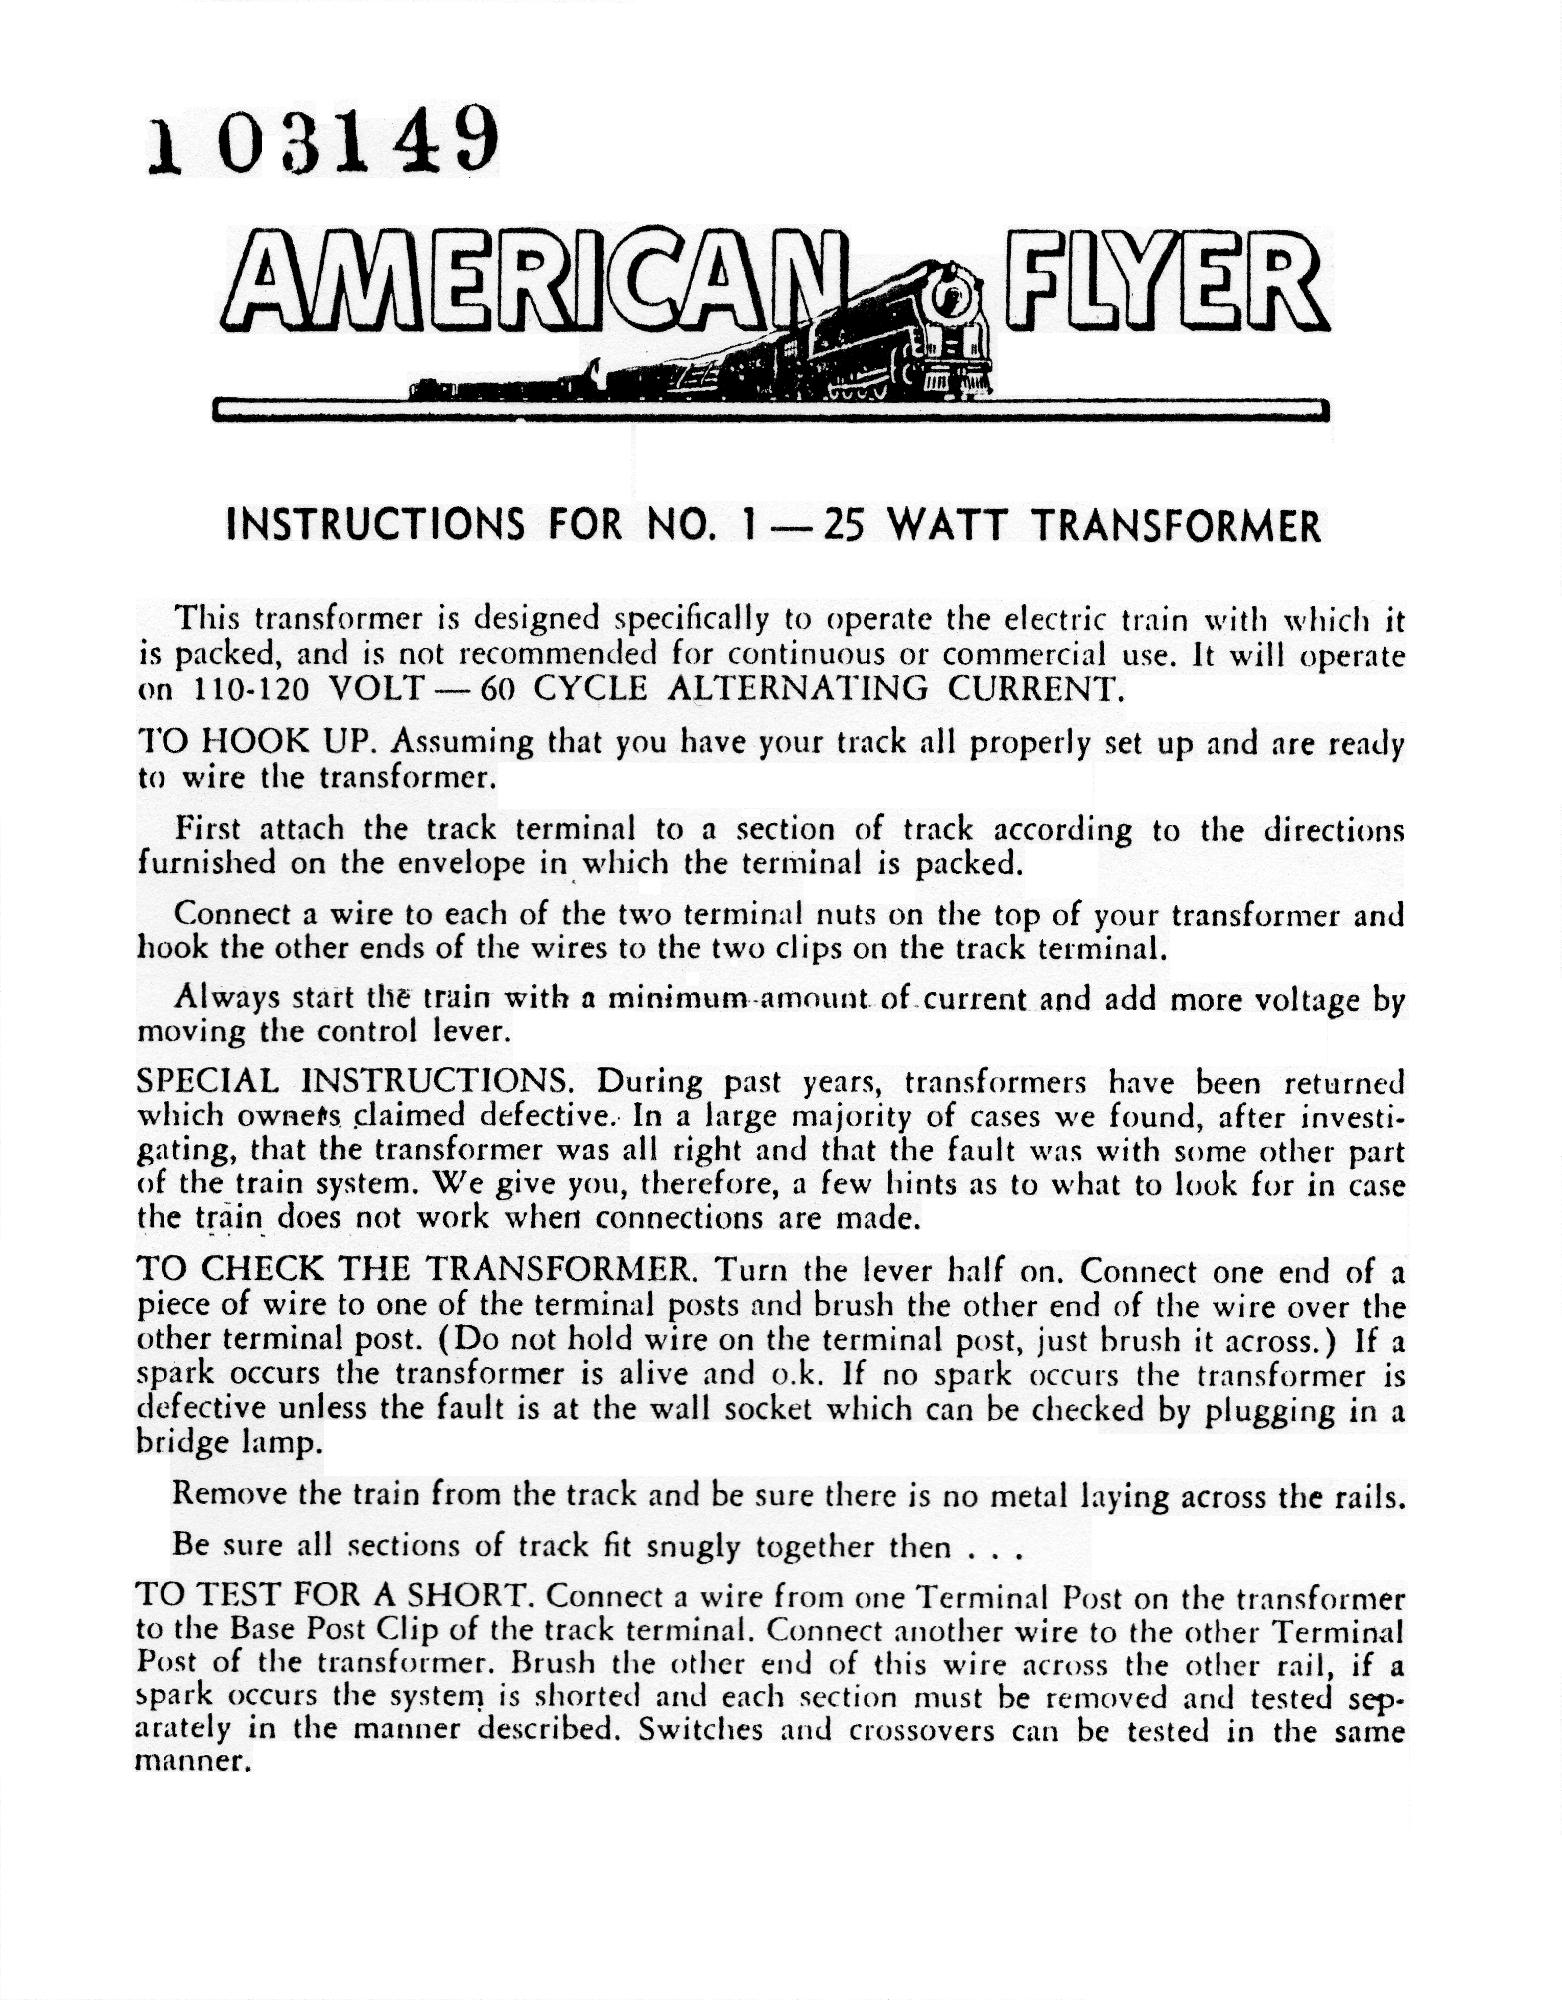 Instructions for No. 1 - 25W Transformer